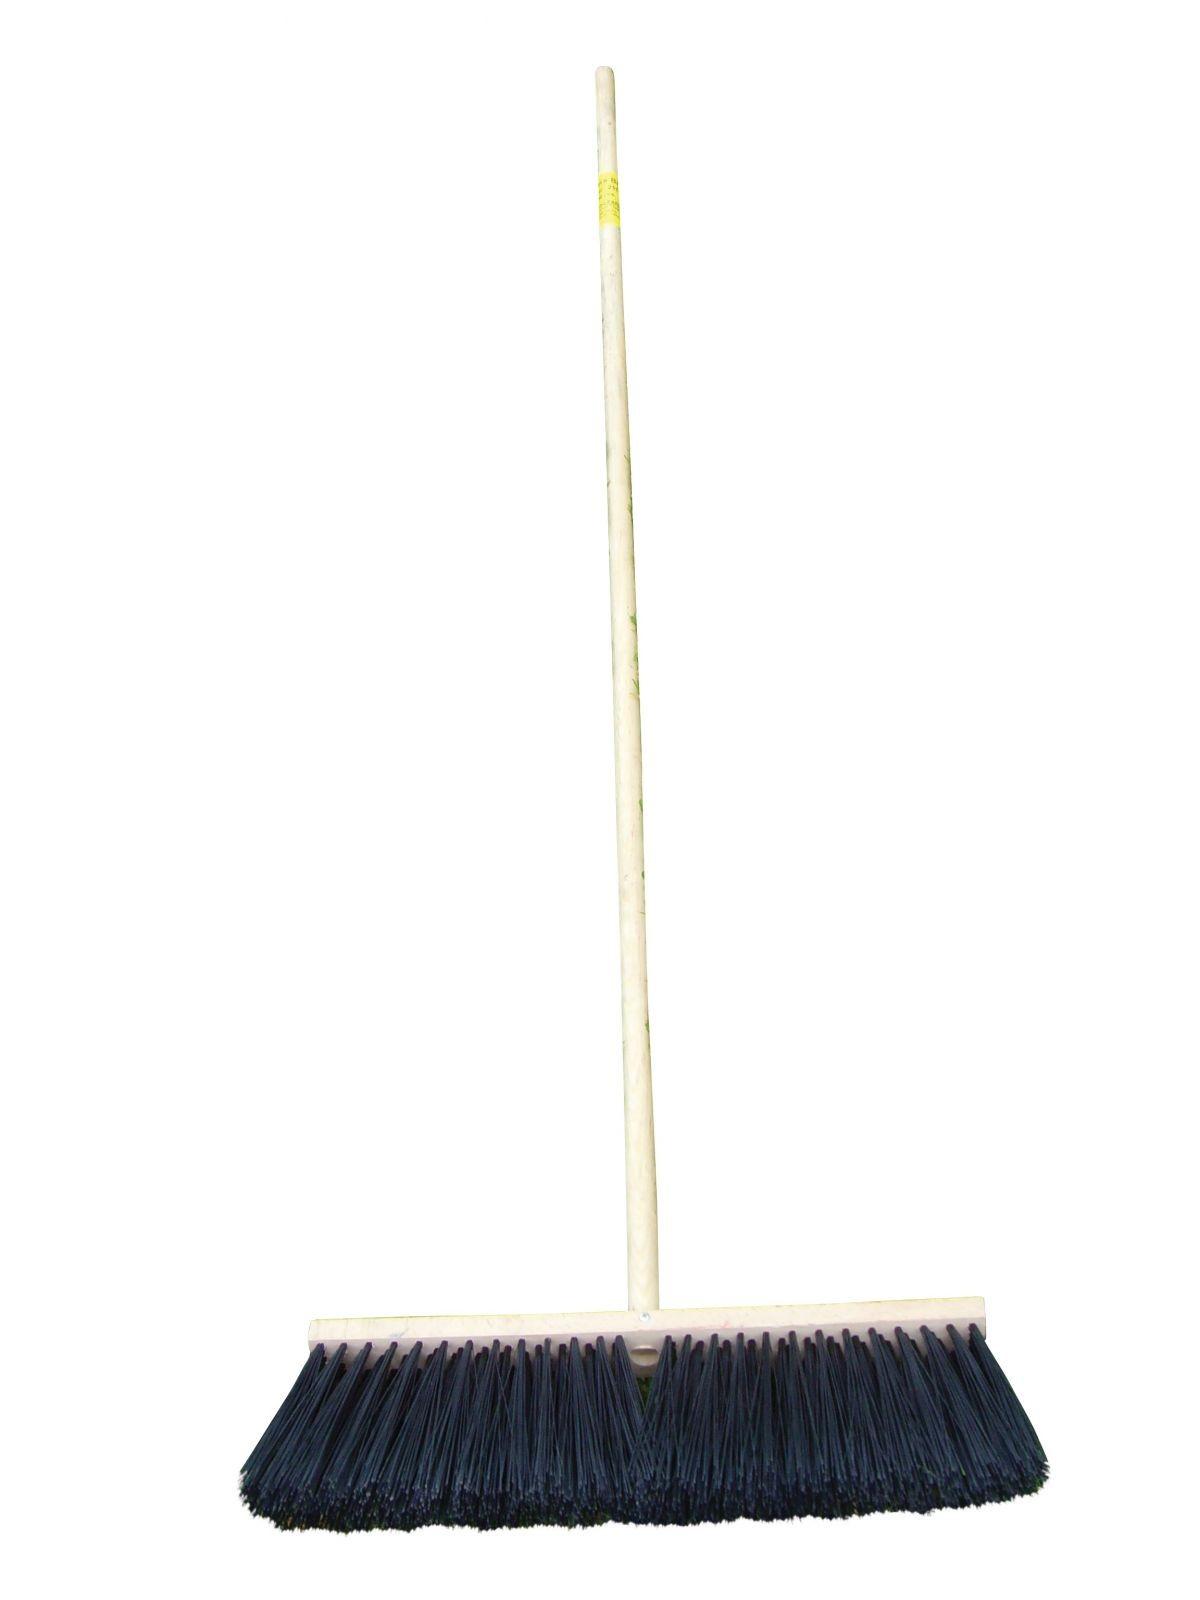 Borstiq Farmers Broom 50cm